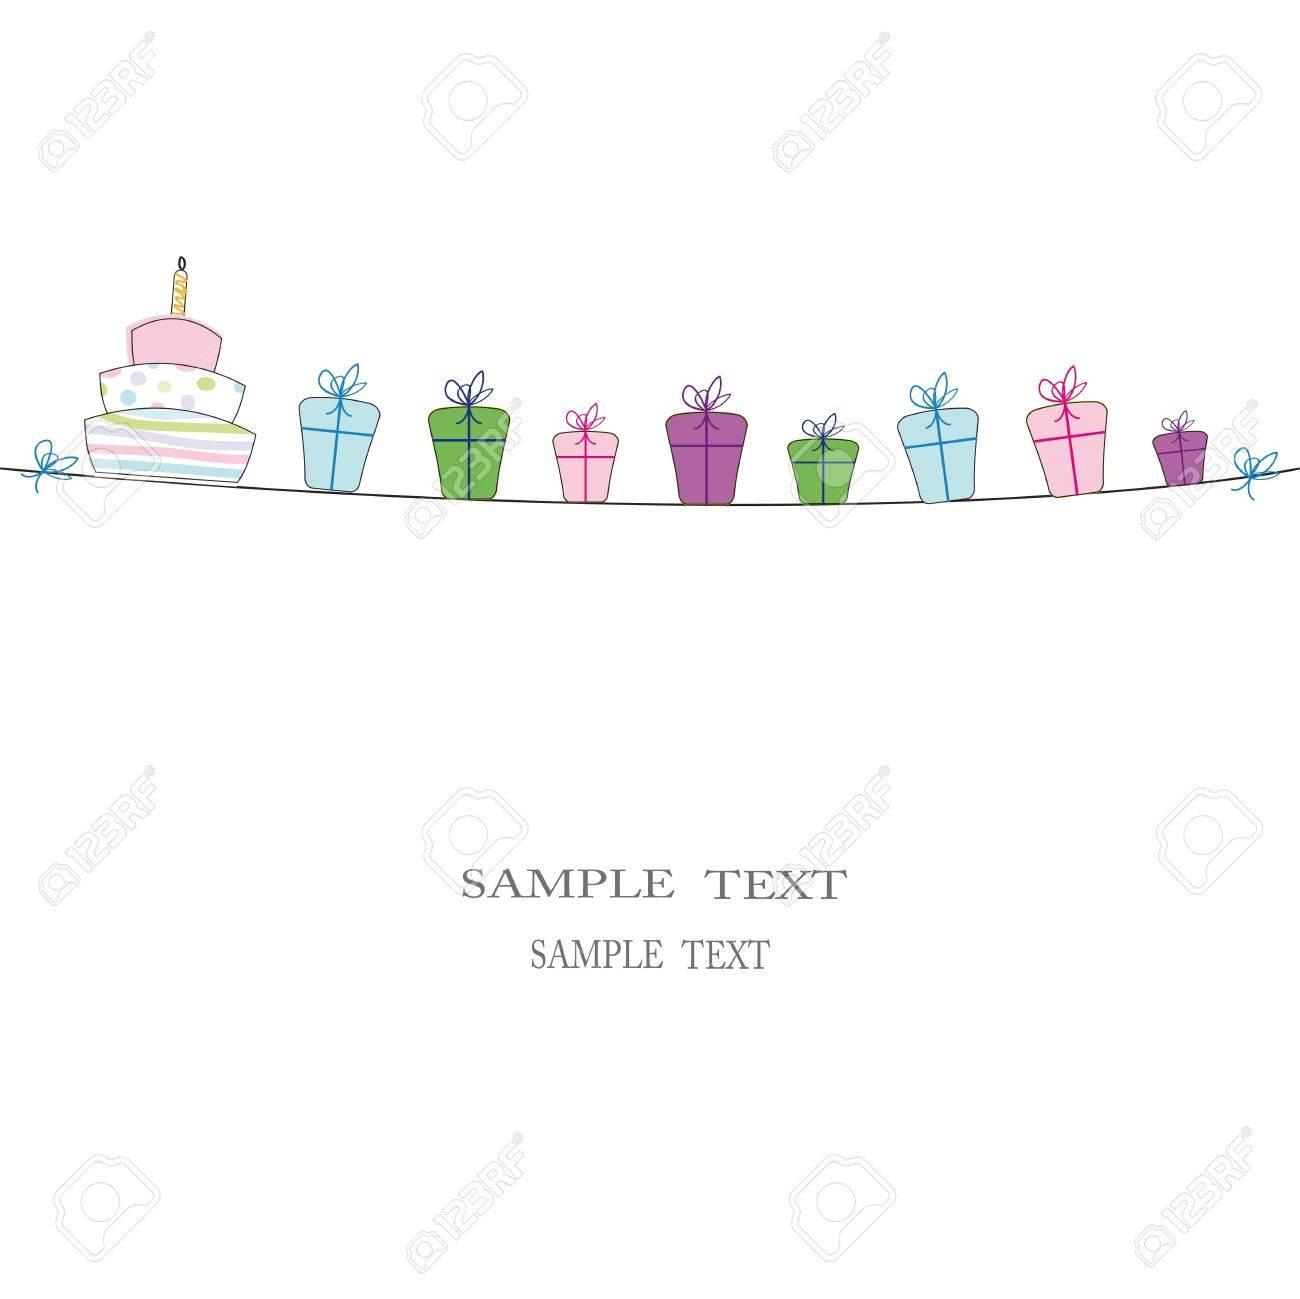 Cute card on festivite occassion Stock Photo - 9357147